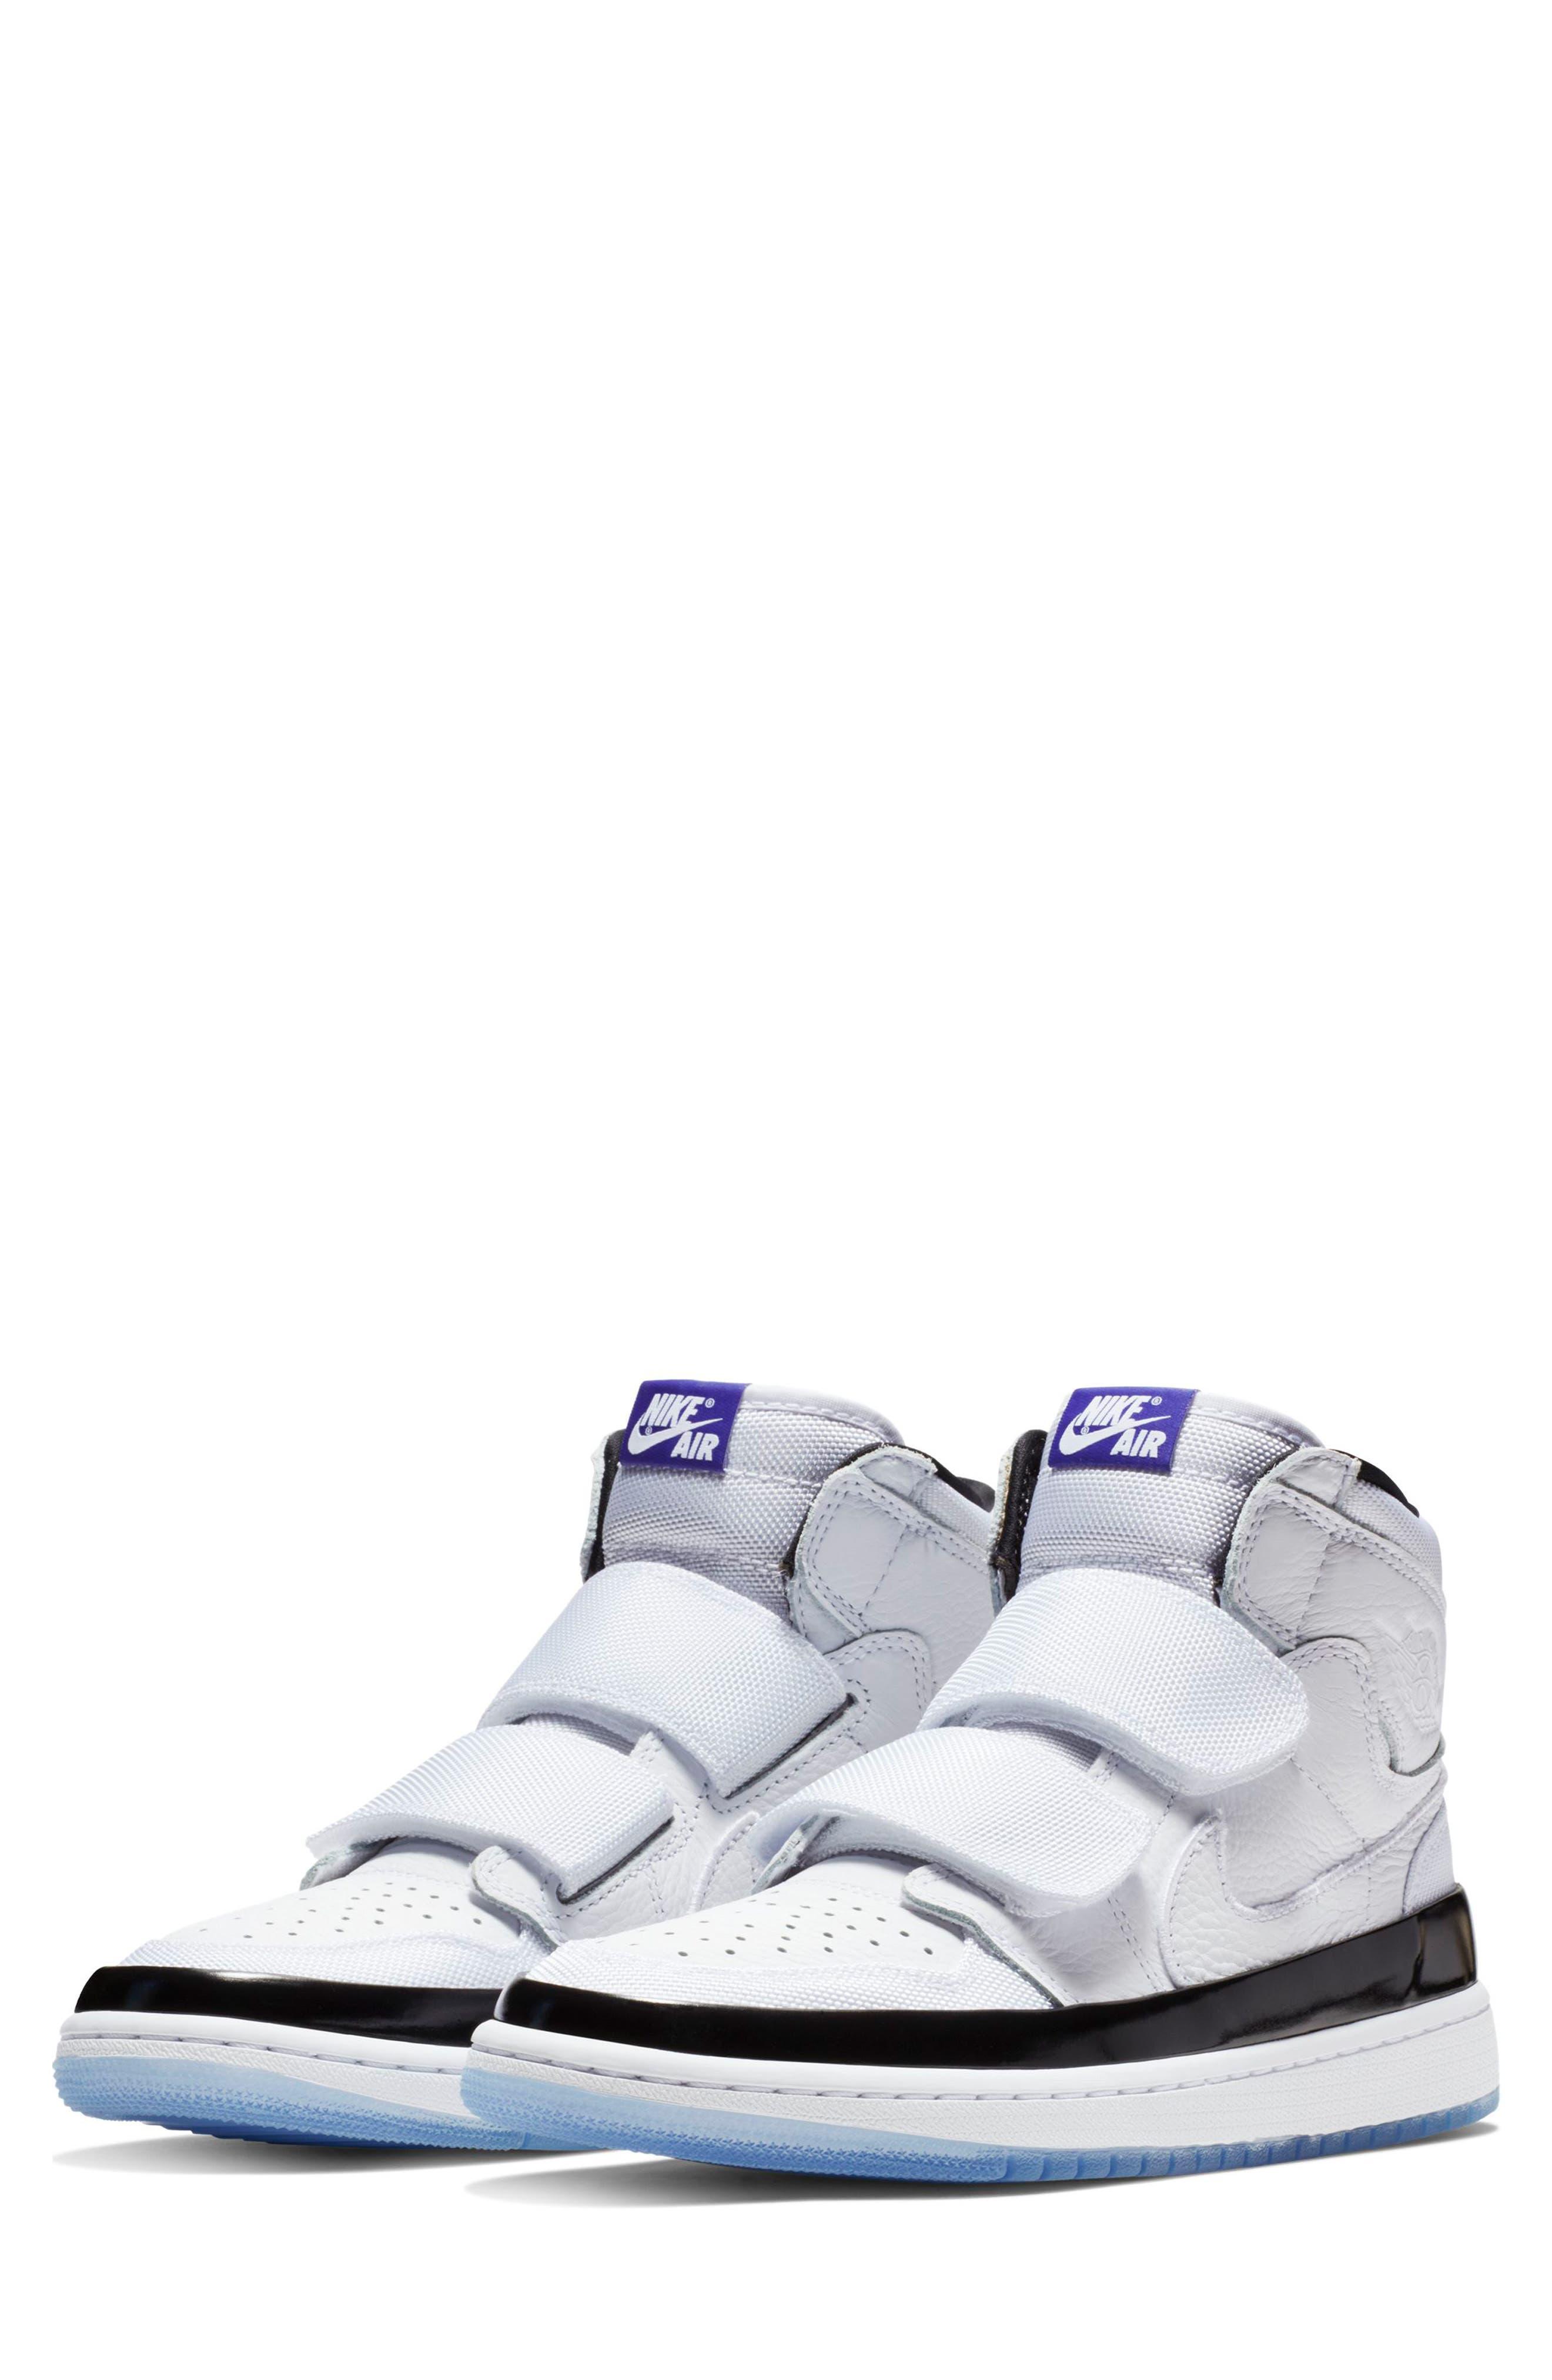 Air Jordan 1 Retro High Double Strap Sneaker,                         Main,                         color, WHITE/ DARK CONCORD/ BLACK